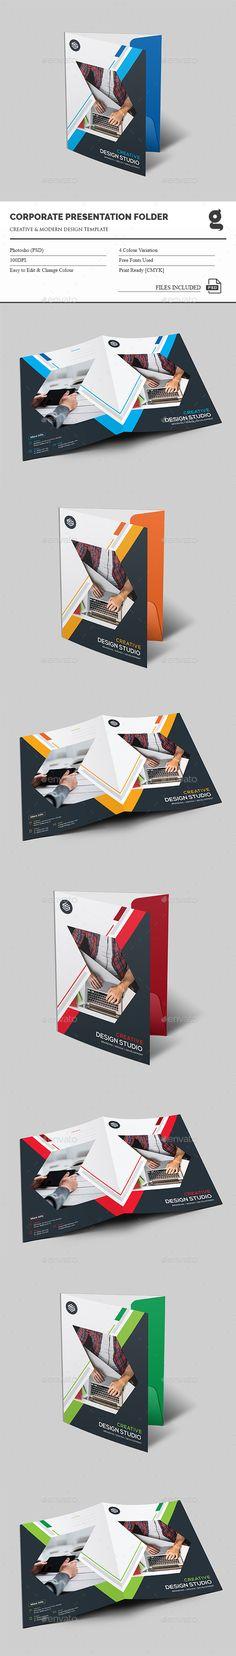 Presentation Folder Design Template - Stationery Print Template PSD. Download here: http://graphicriver.net/item/presentation-folder/16428744?s_rank=64&ref=yinkira